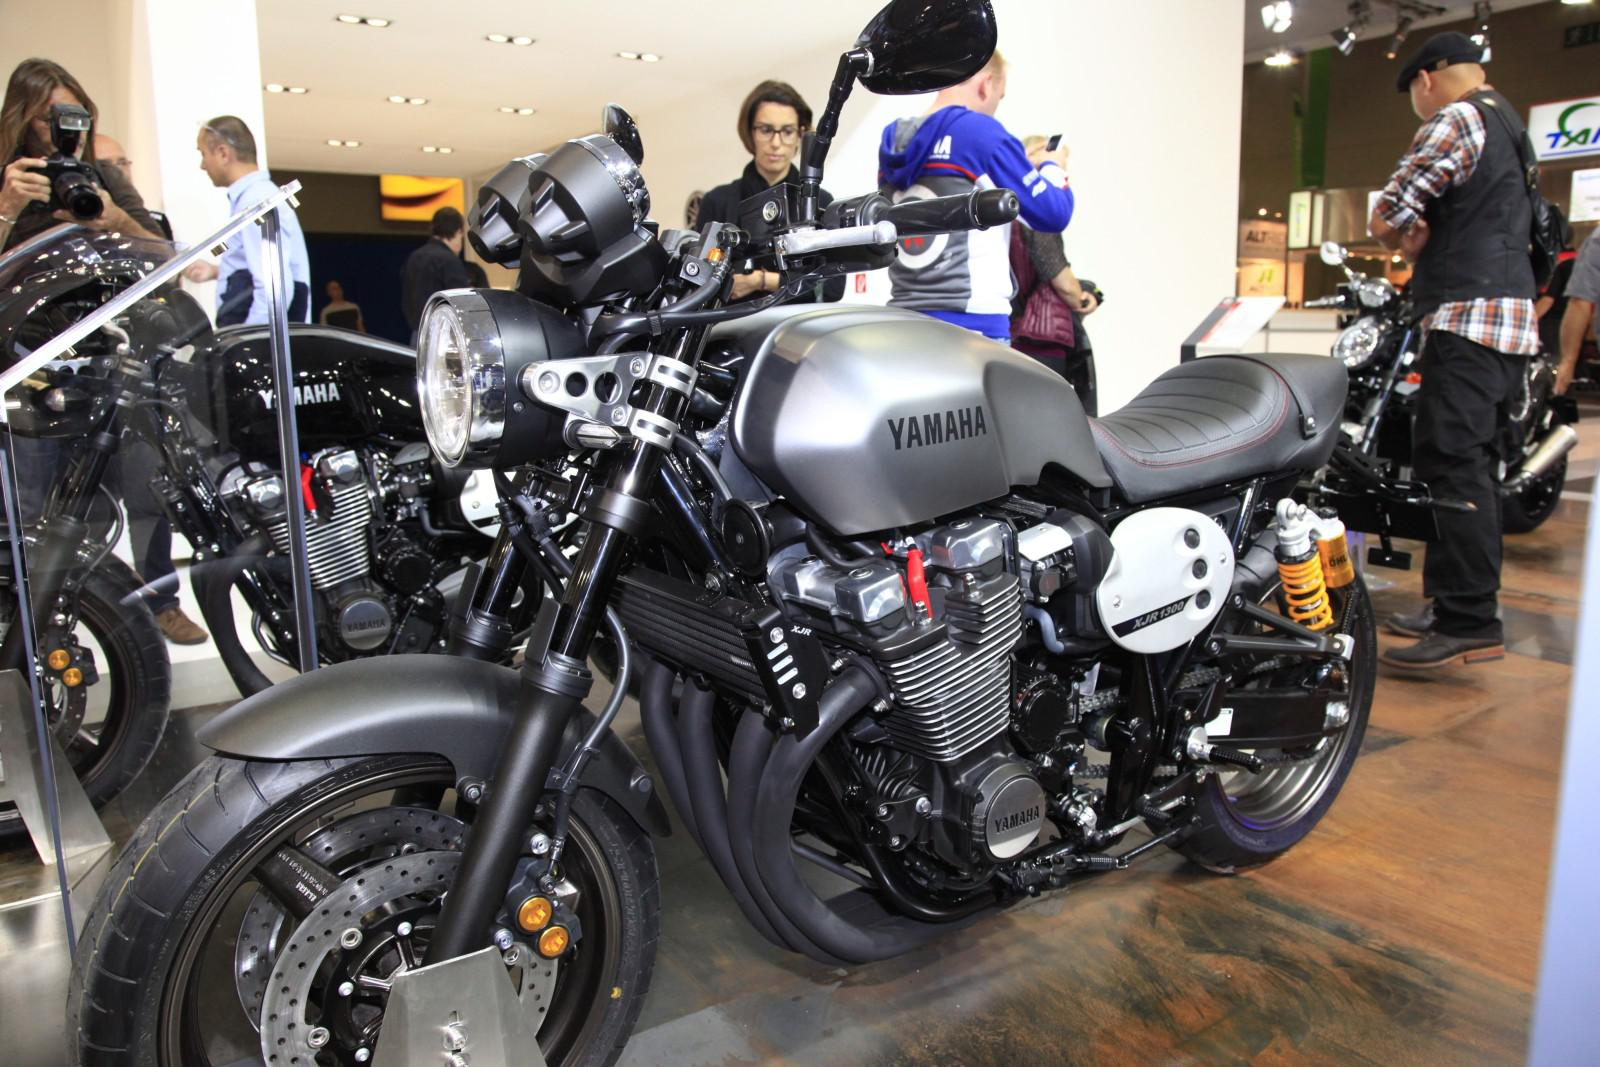 Yamaha XJR 1300 Foto